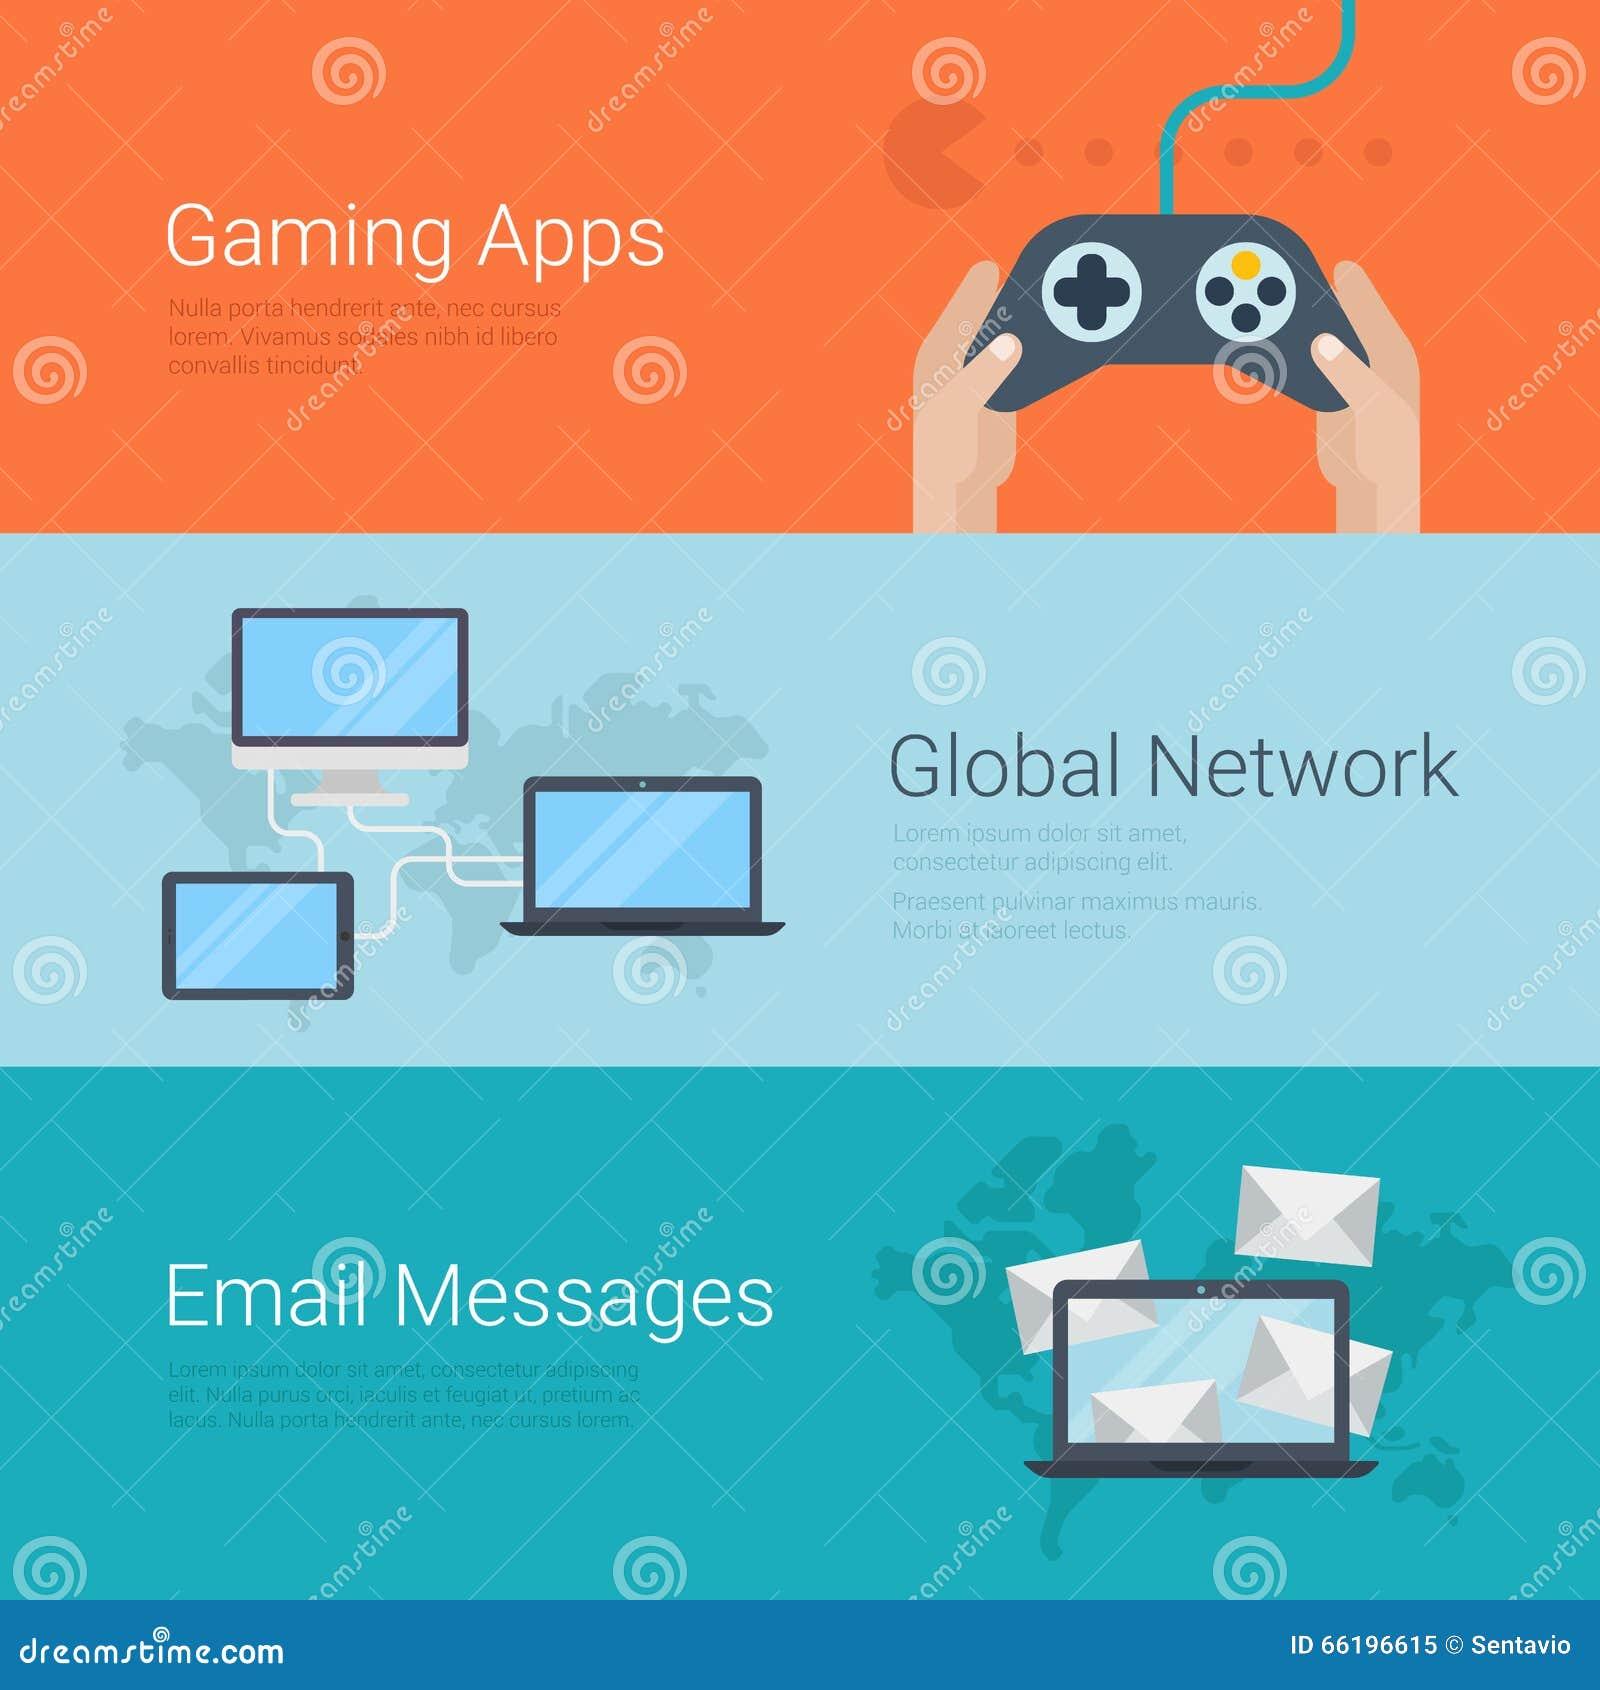 Email network gaming apps website slider banner flat vector